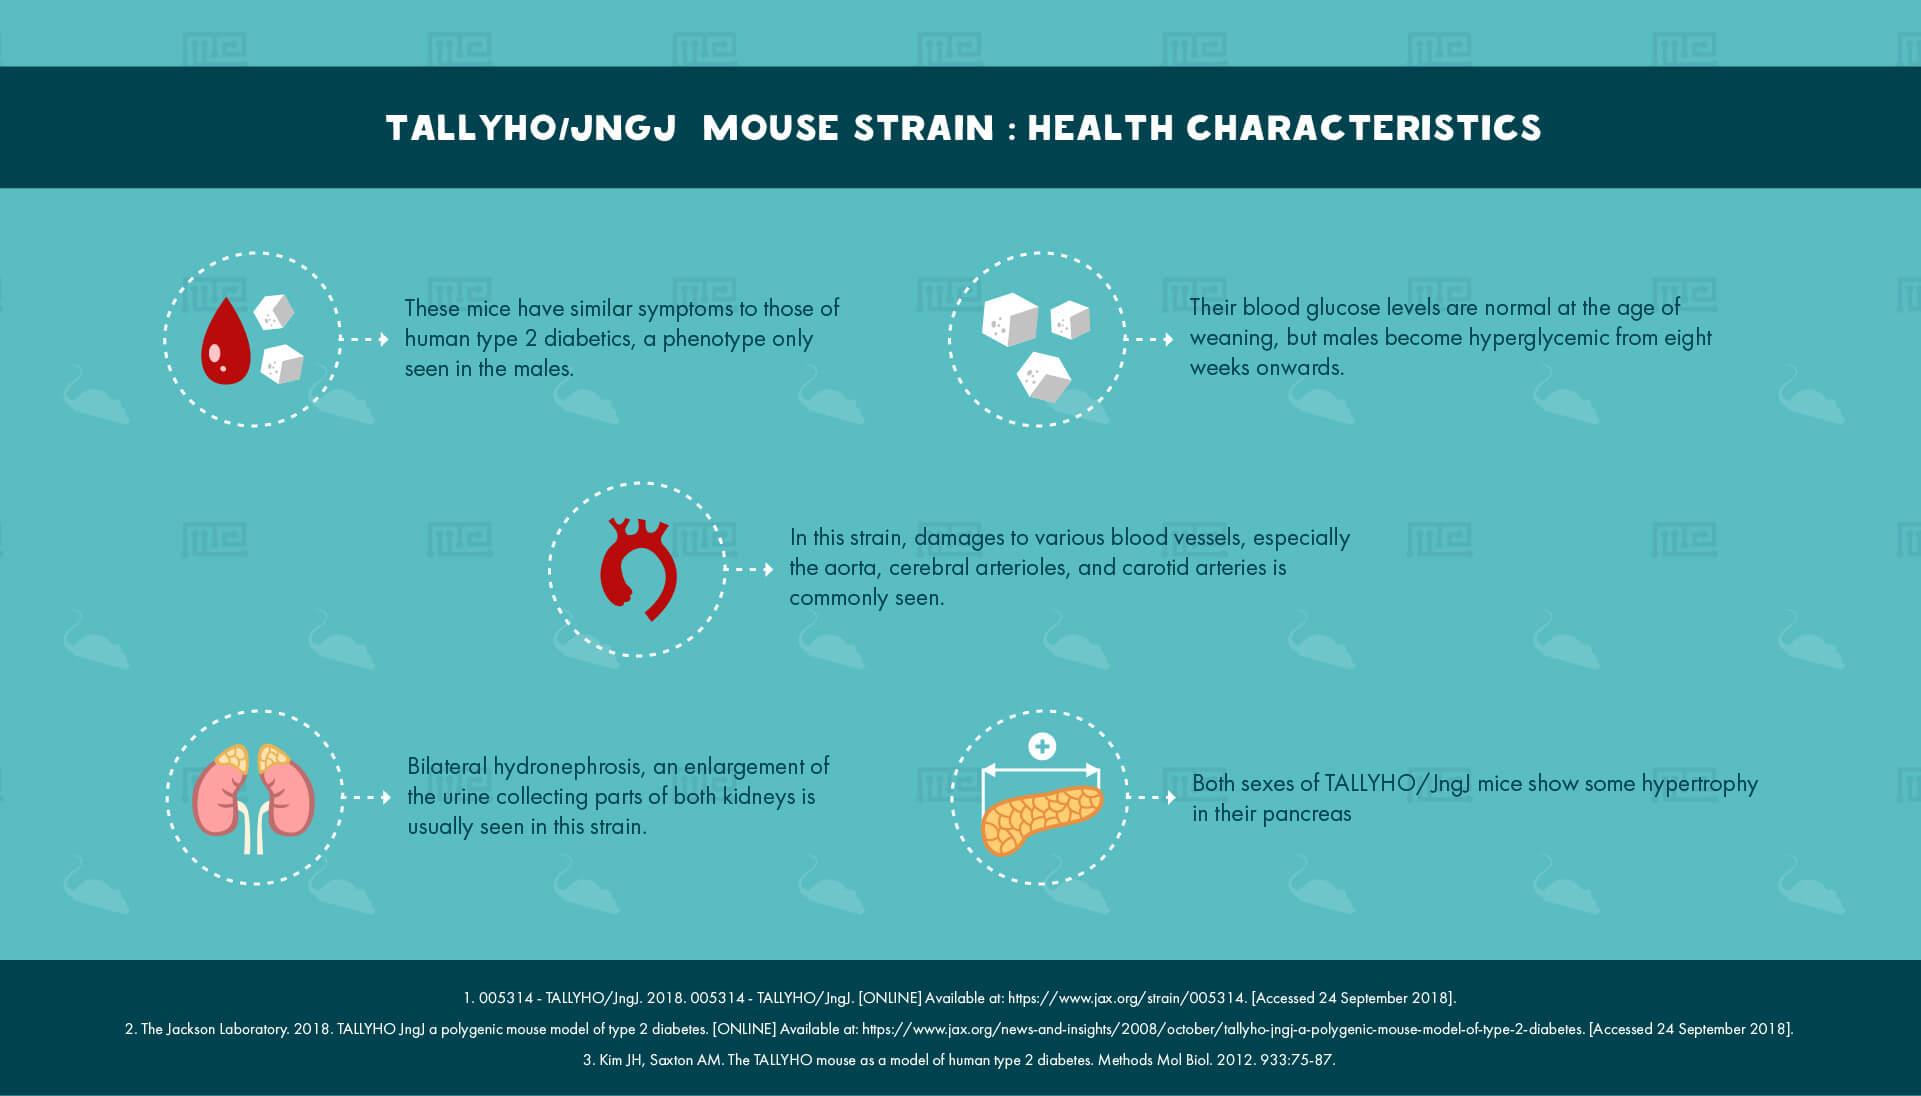 TALLYHO JngJ Mouse Strain - health Characteristics